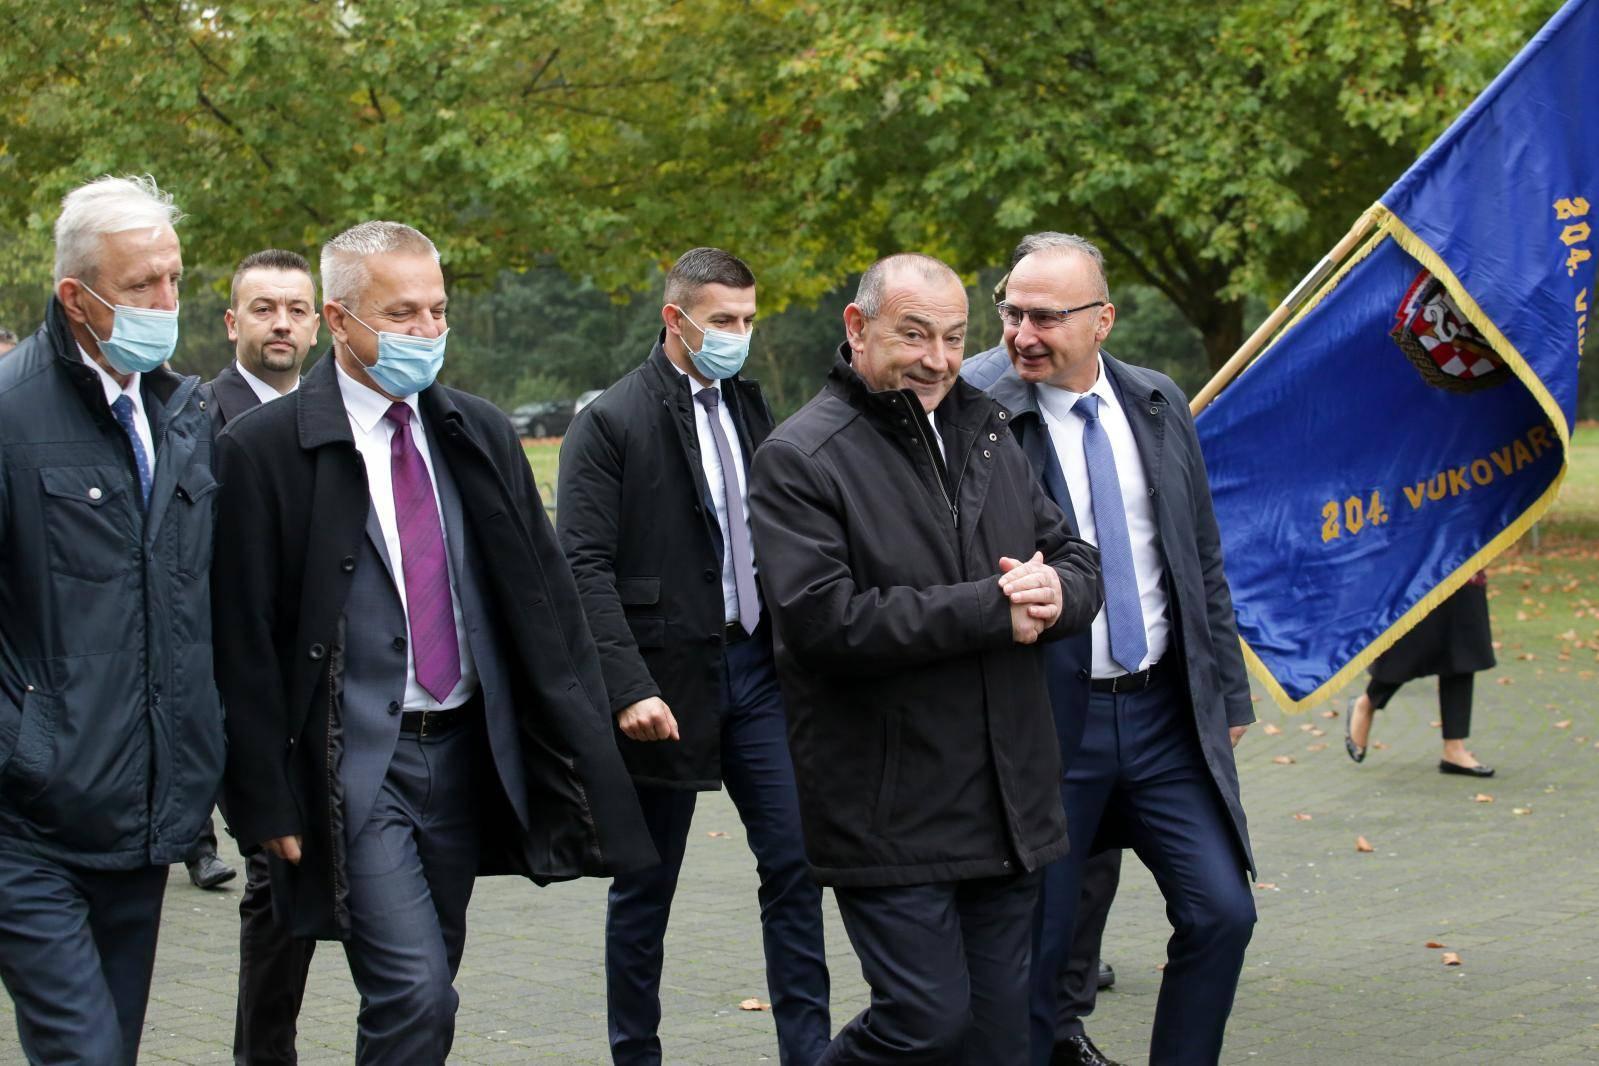 U Vukovaru obilježena 29. godišnjica smrti general-bojnika Blage Zadre